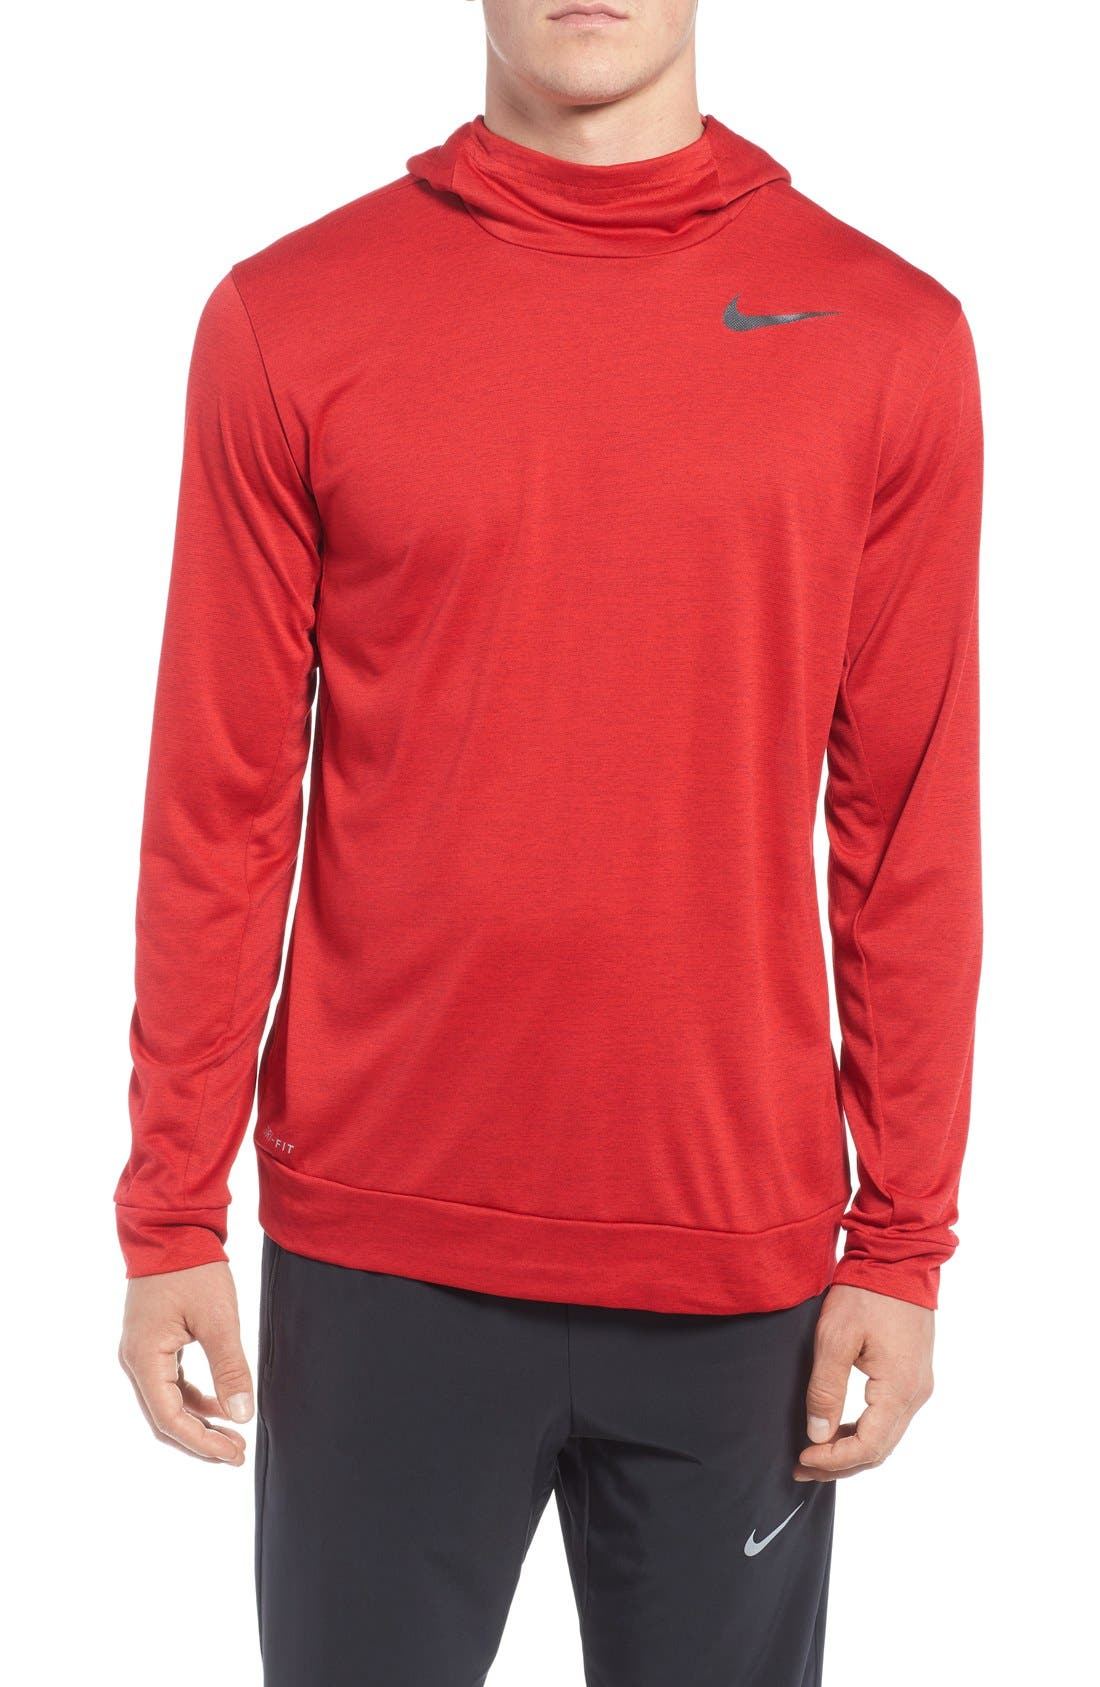 Main Image - Nike Dri-FIT Training Hoodie